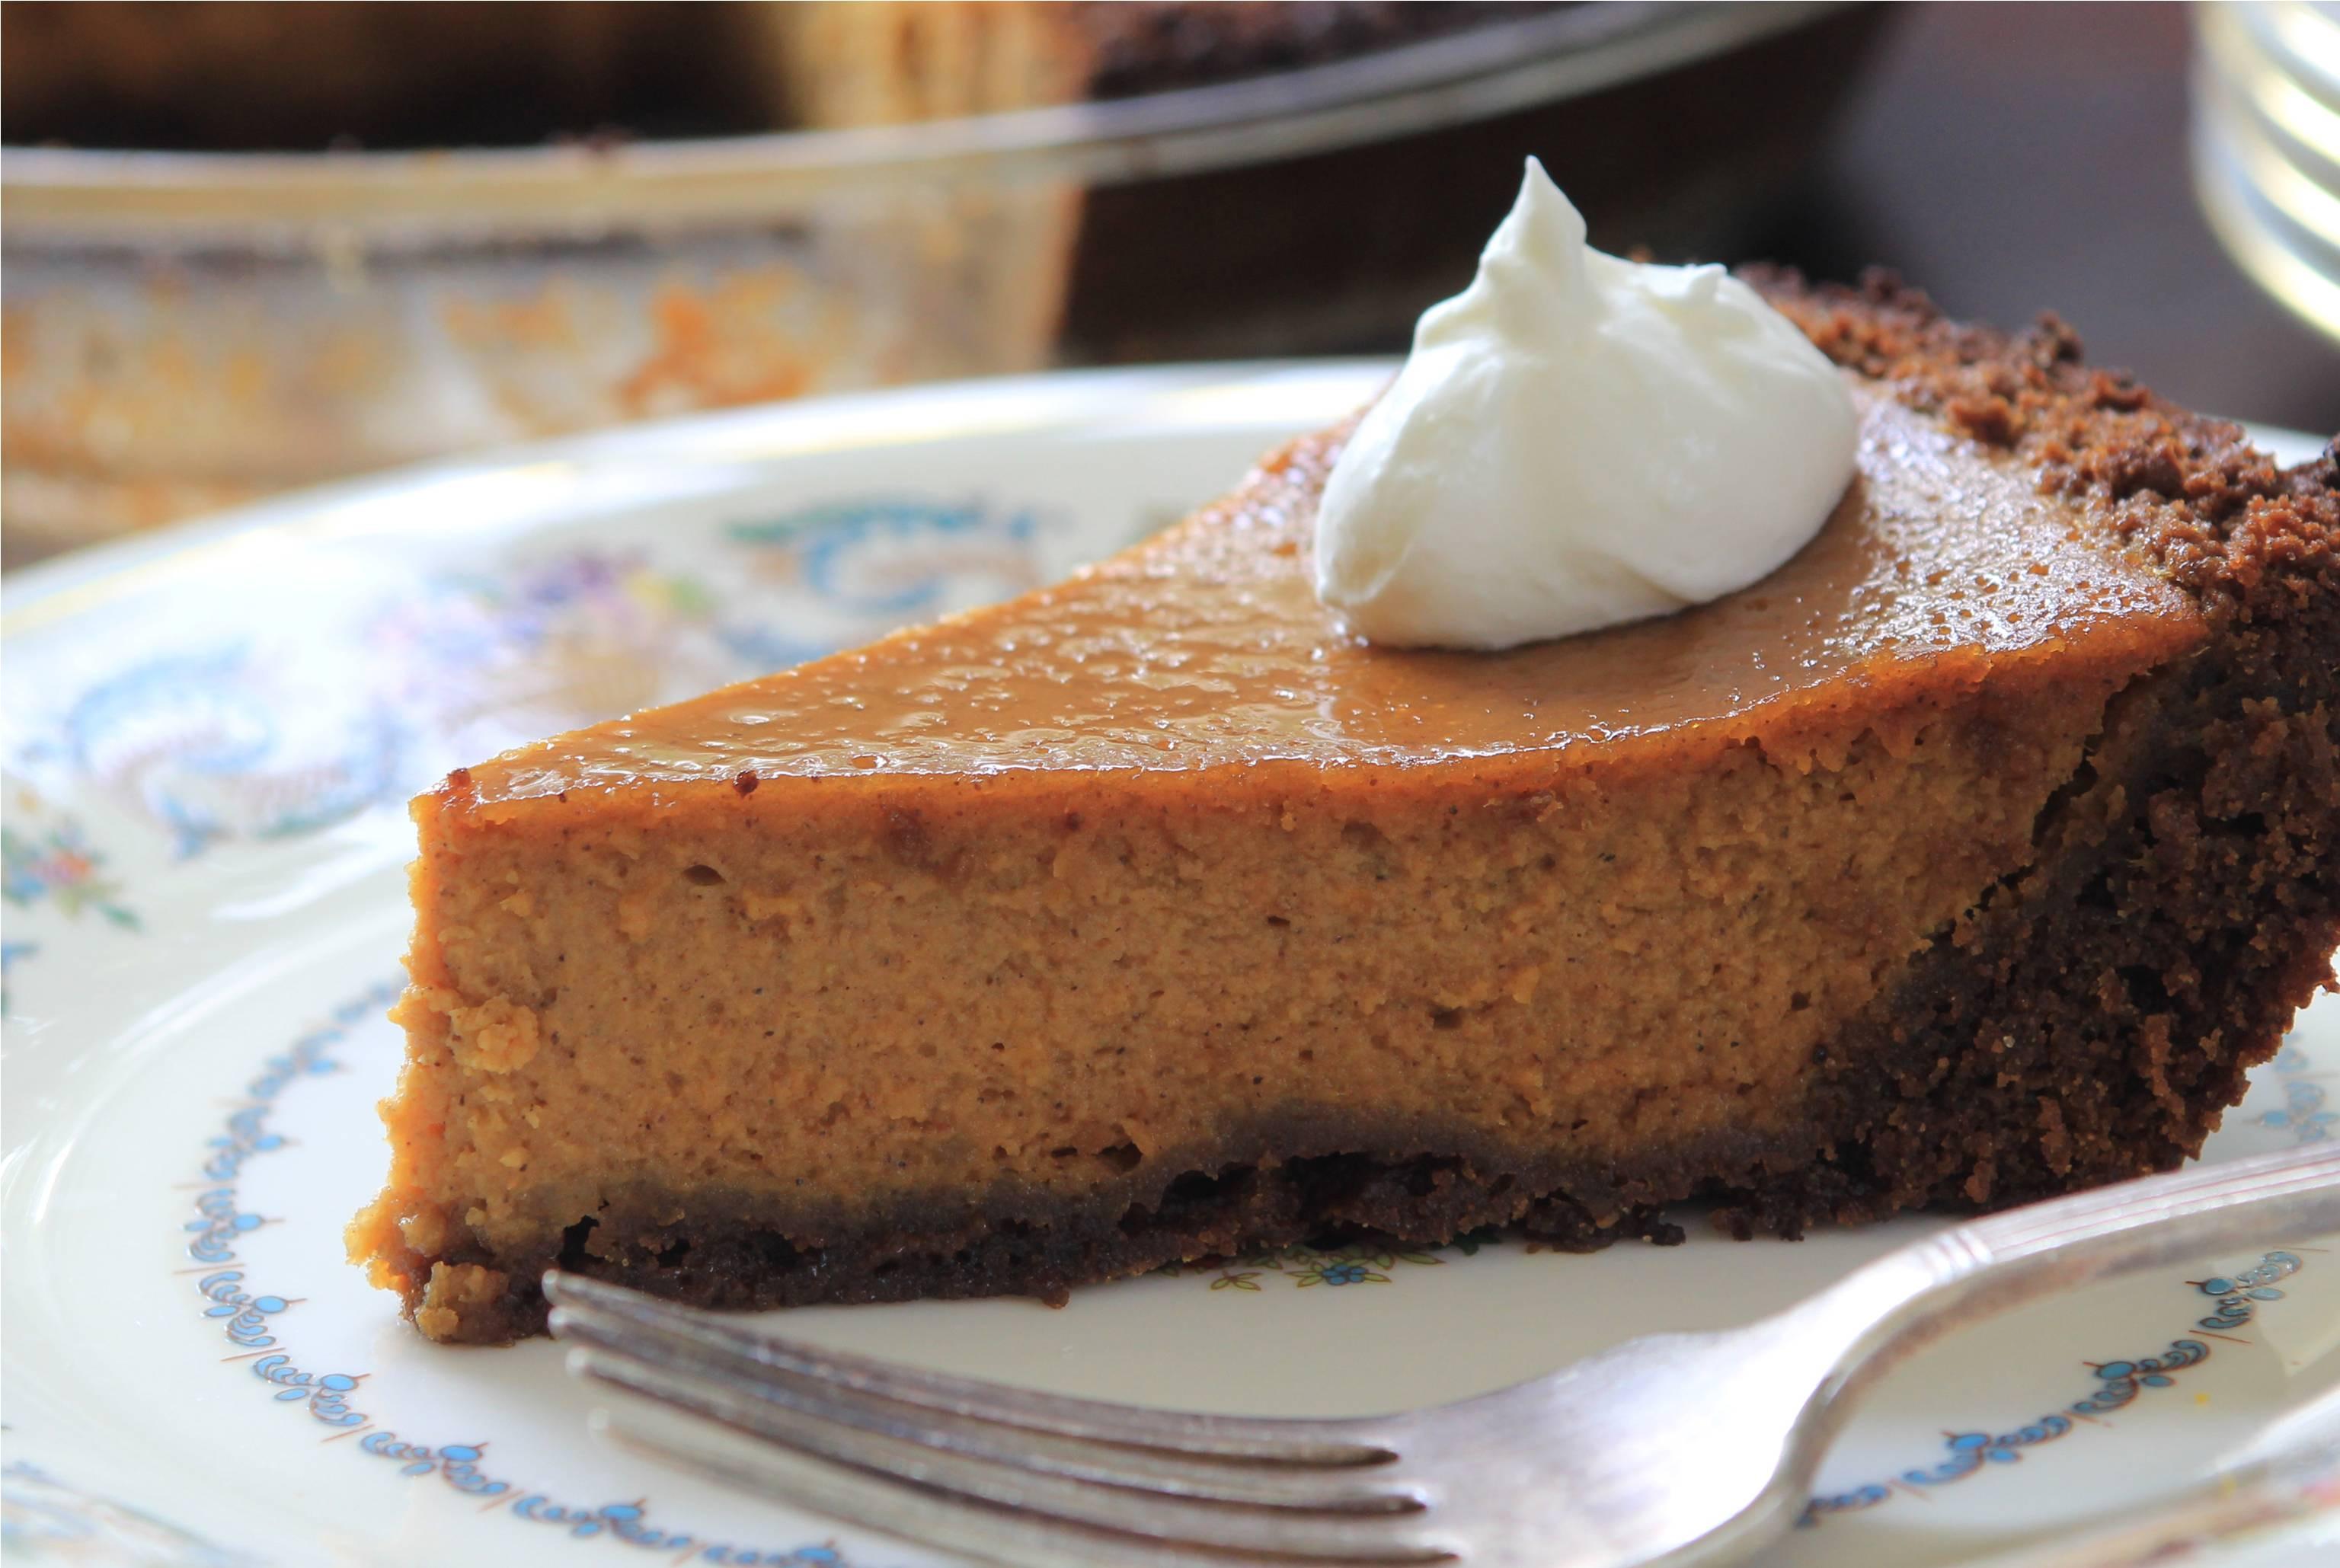 Pumpkin Pie With Gingersnap Crust  Bourbon Pumpkin Pie with Gingersnap Crust Farberware